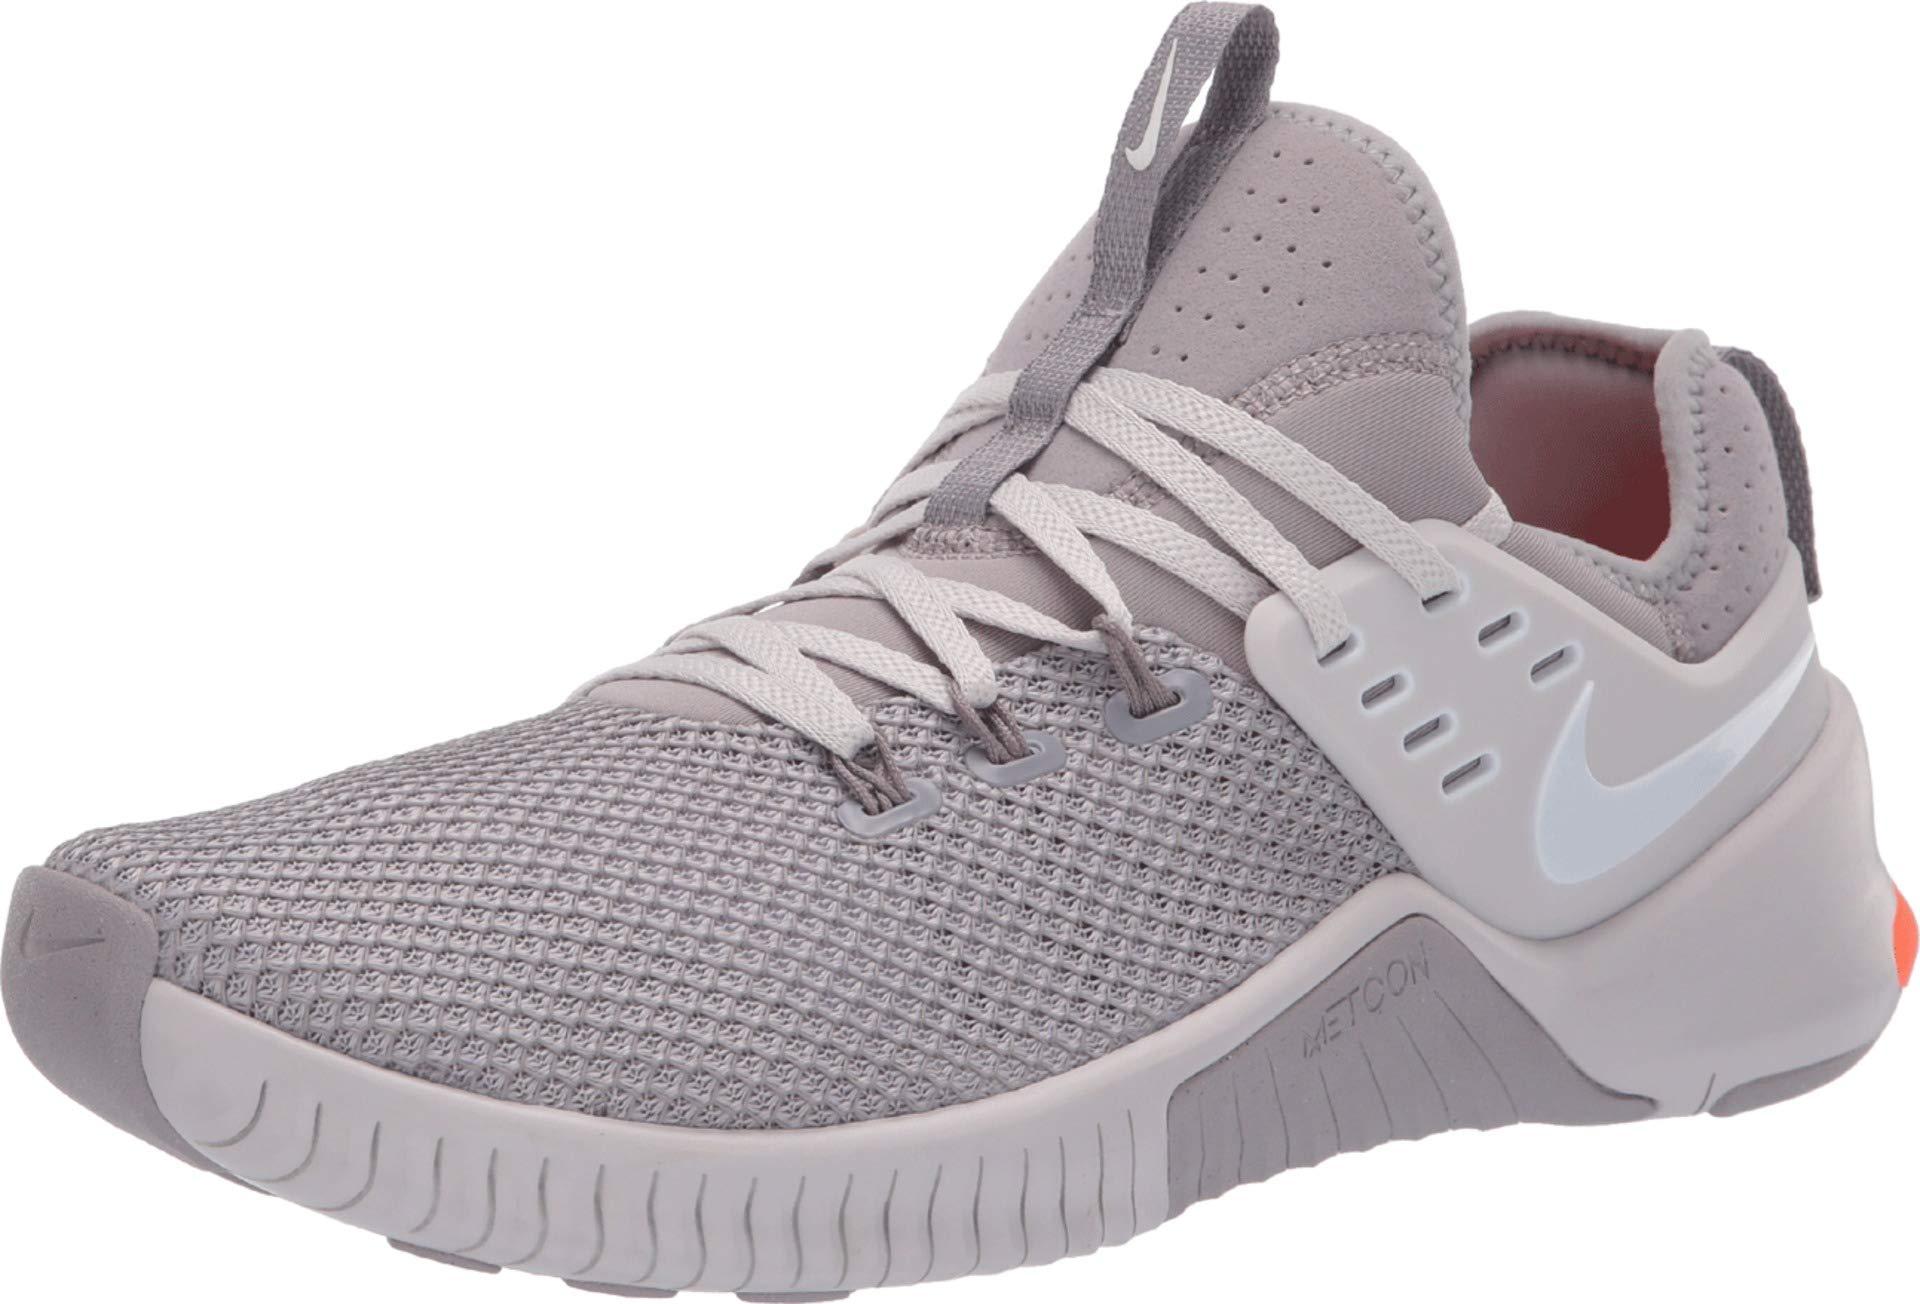 5de67645203b Galleon - Nike Men s Metcon Free Training Shoe Atmosphere Grey White-VAST  Grey 11.5